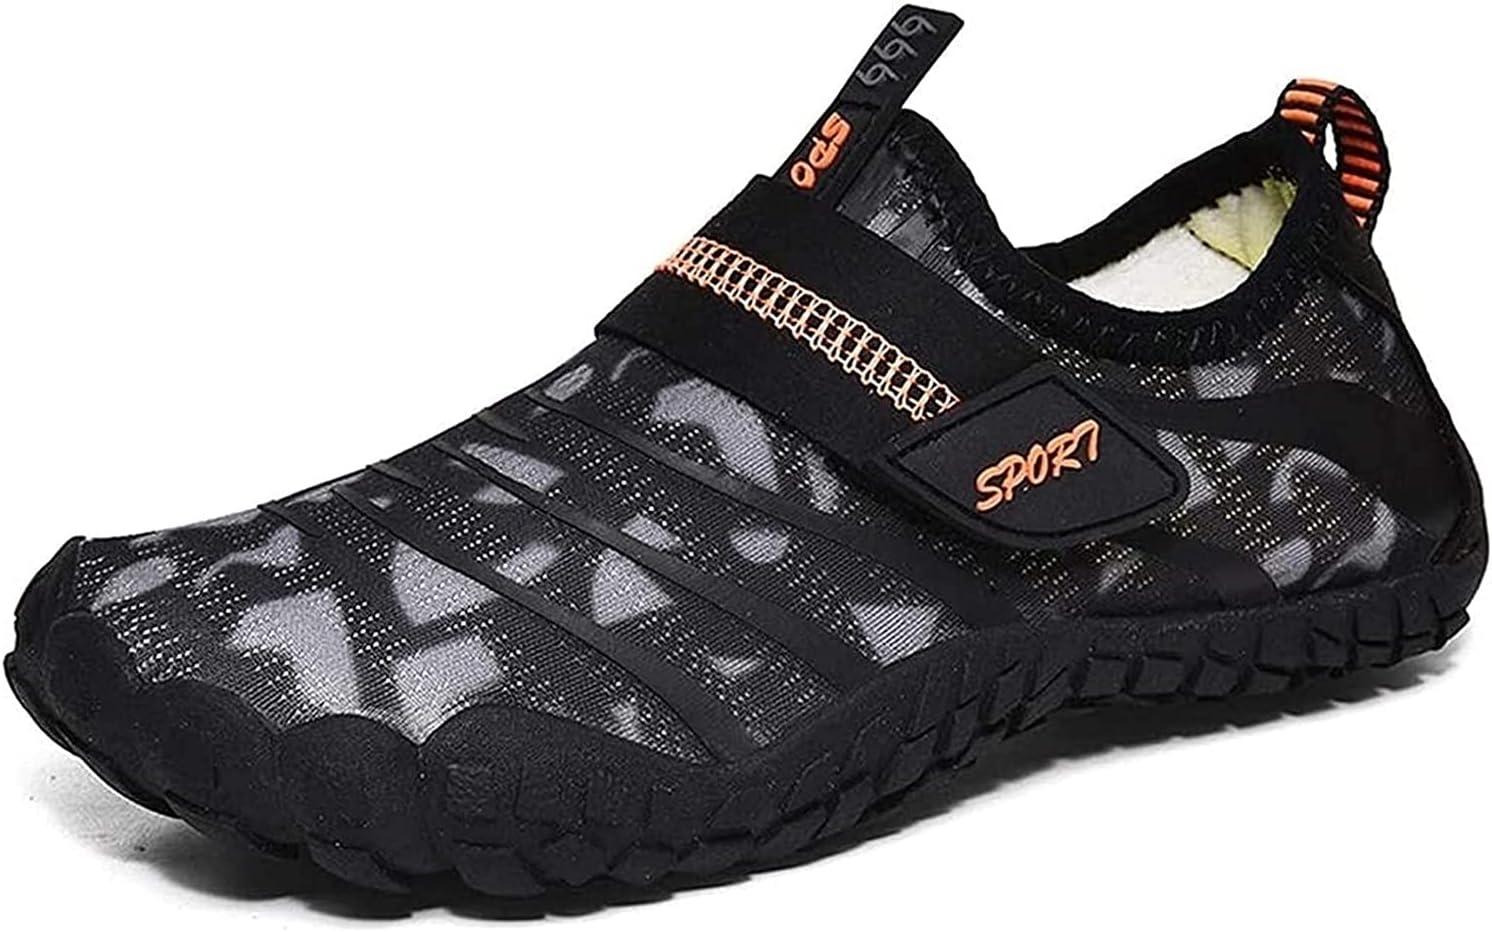 LSZ Bombing new work unisex Swimming Shoes Children's Spor Water Non-Slip Barefoot